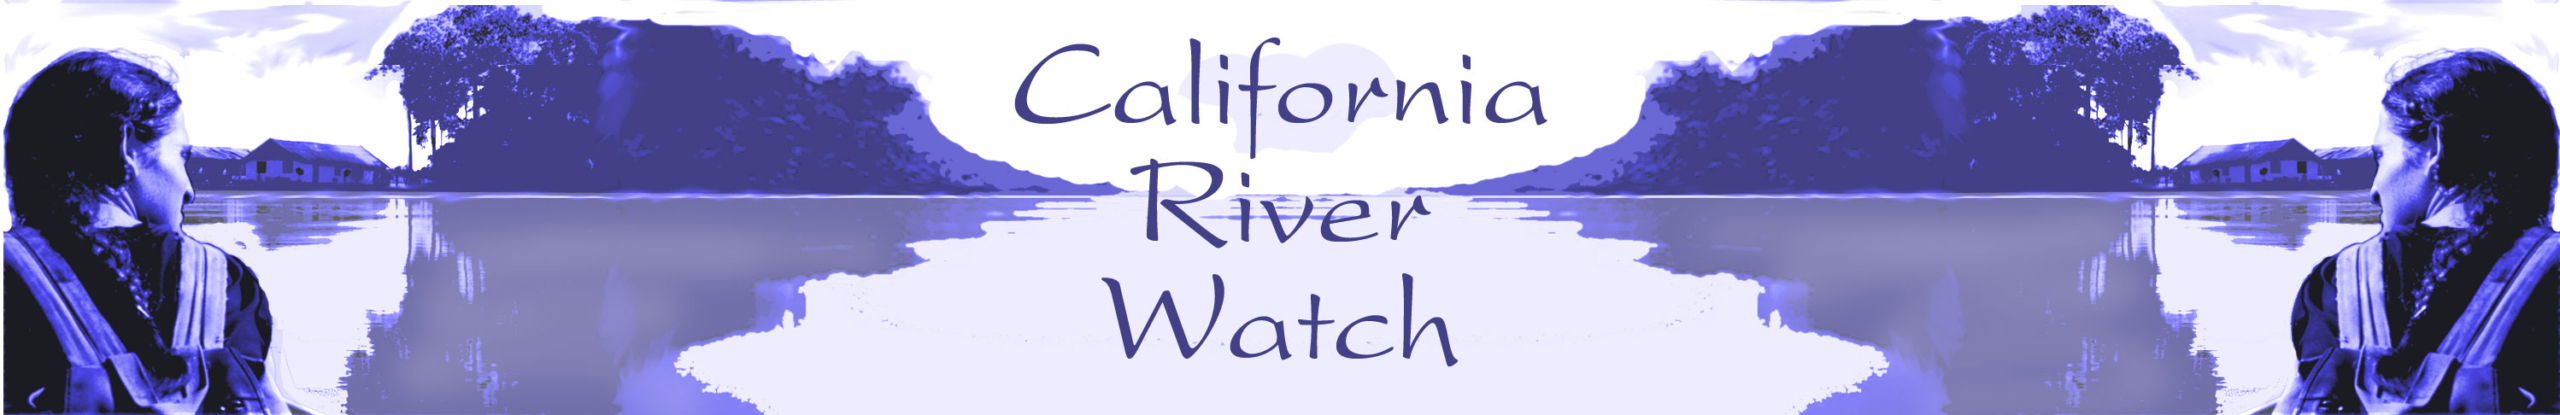 River Watch Header Image